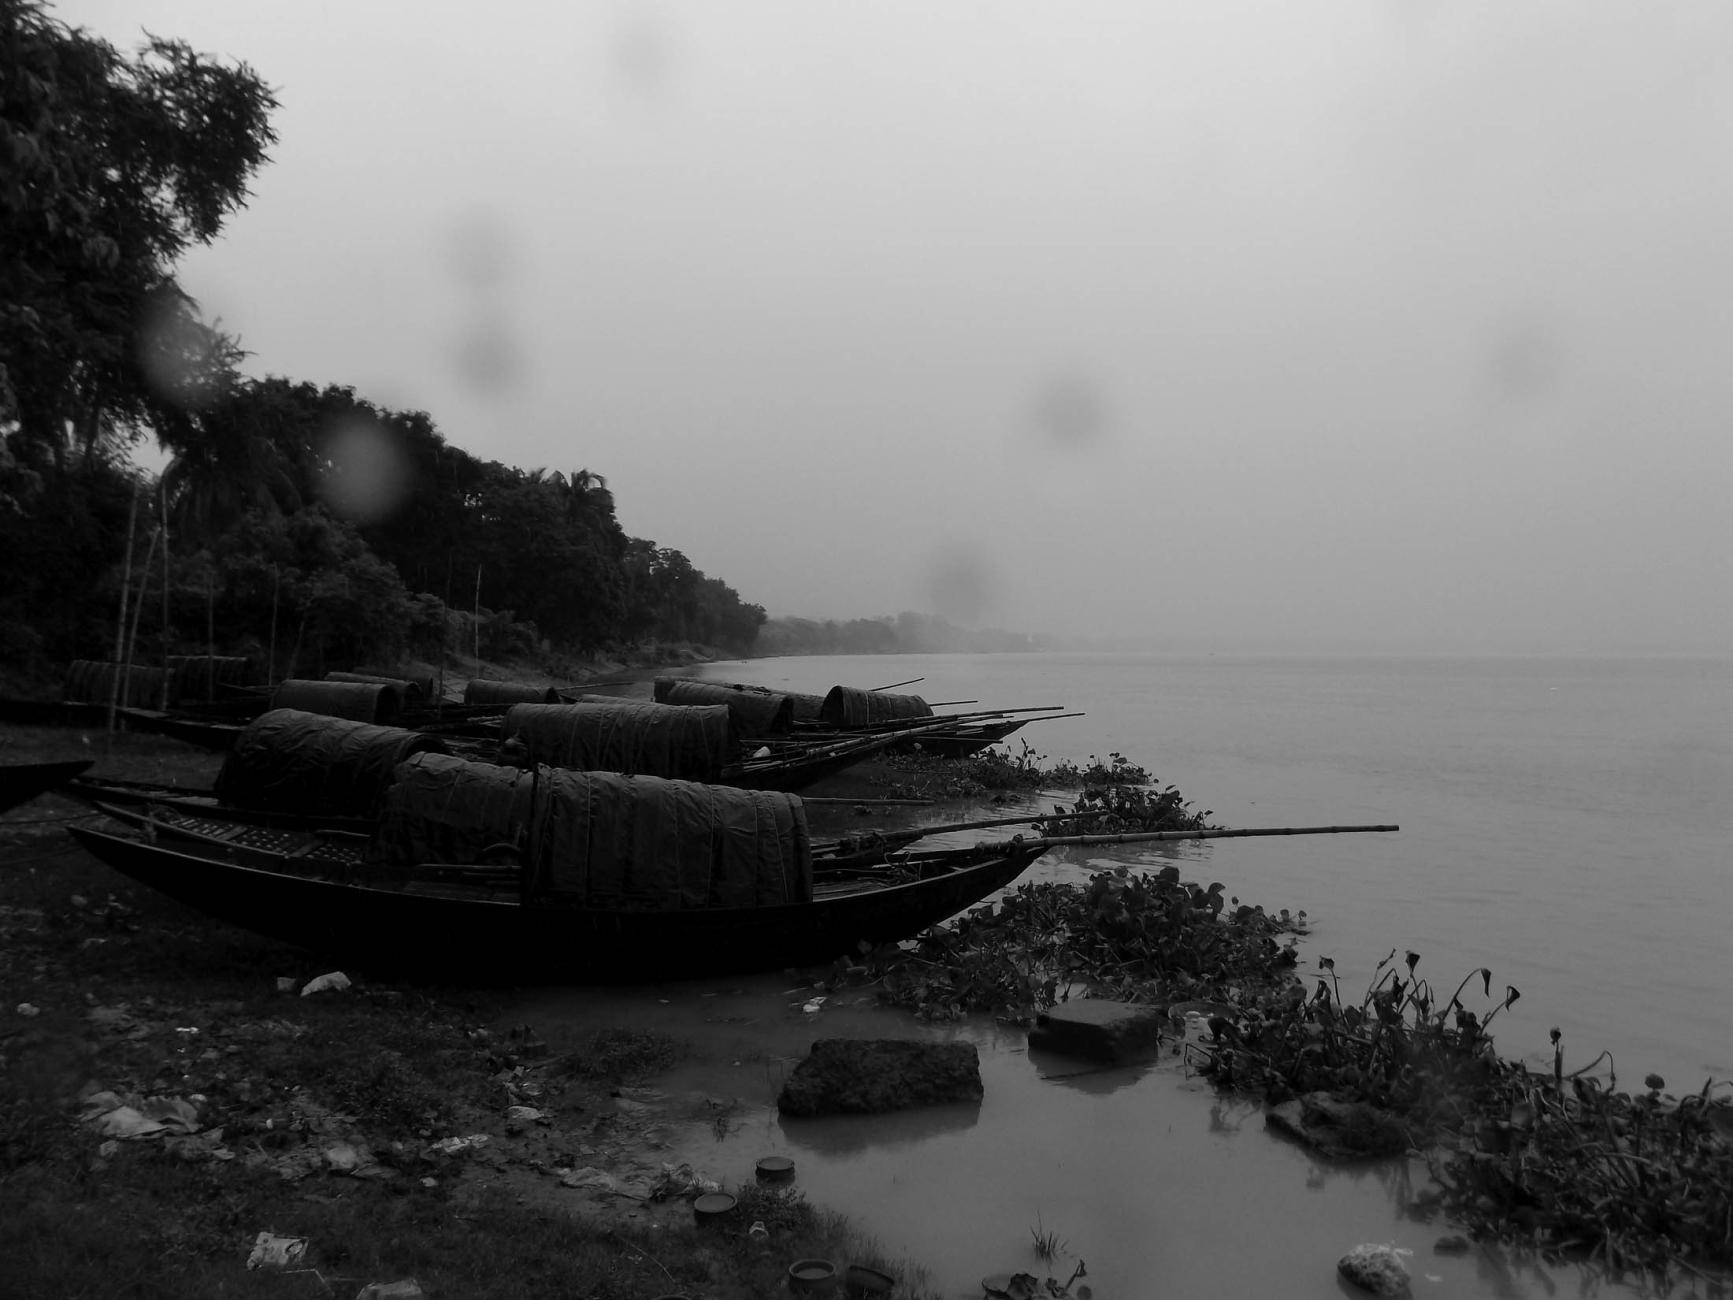 Suvajit's Photography